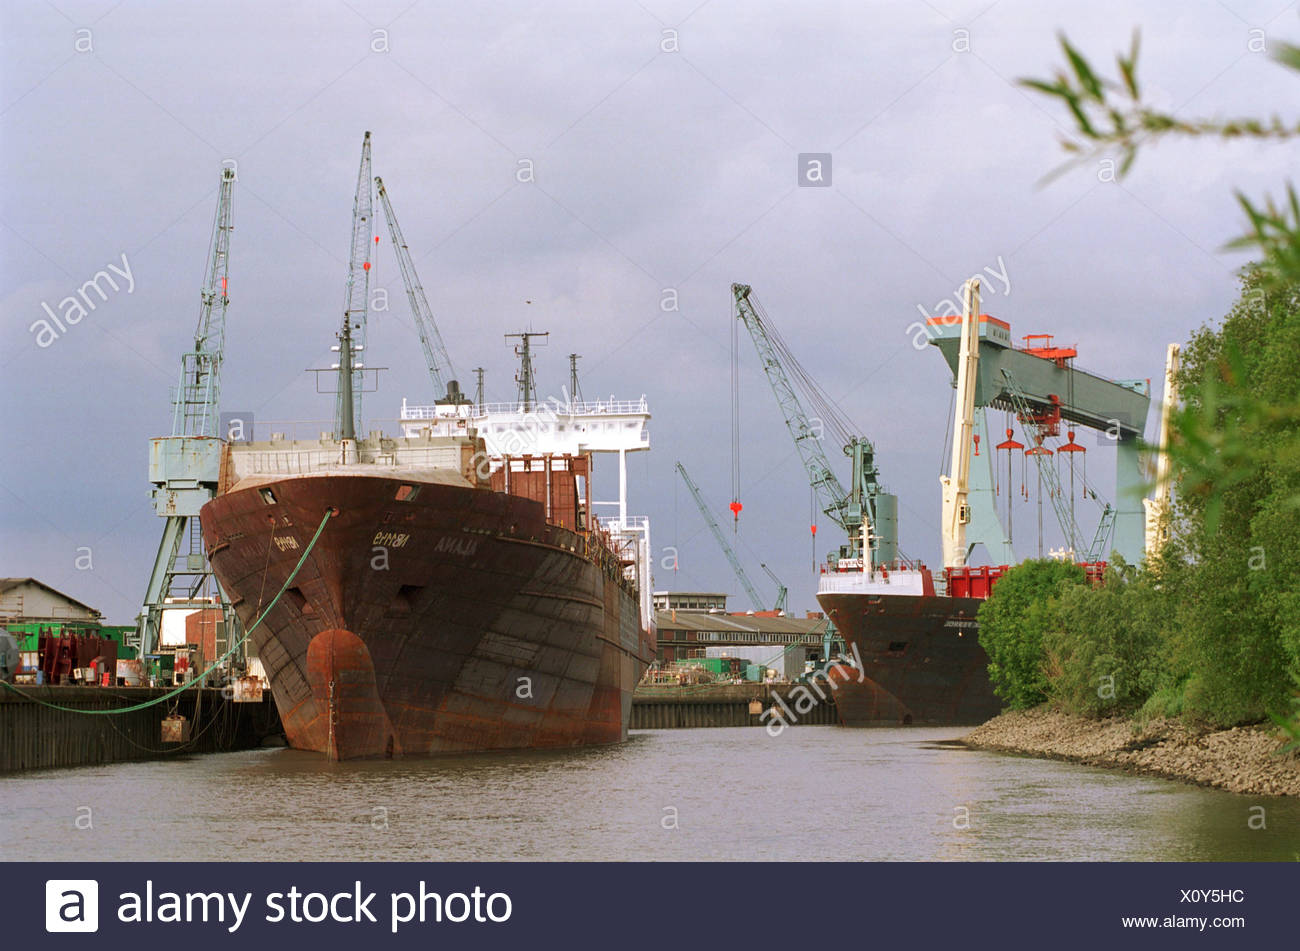 Sietas with ships in Finkenwerder - Stock Image